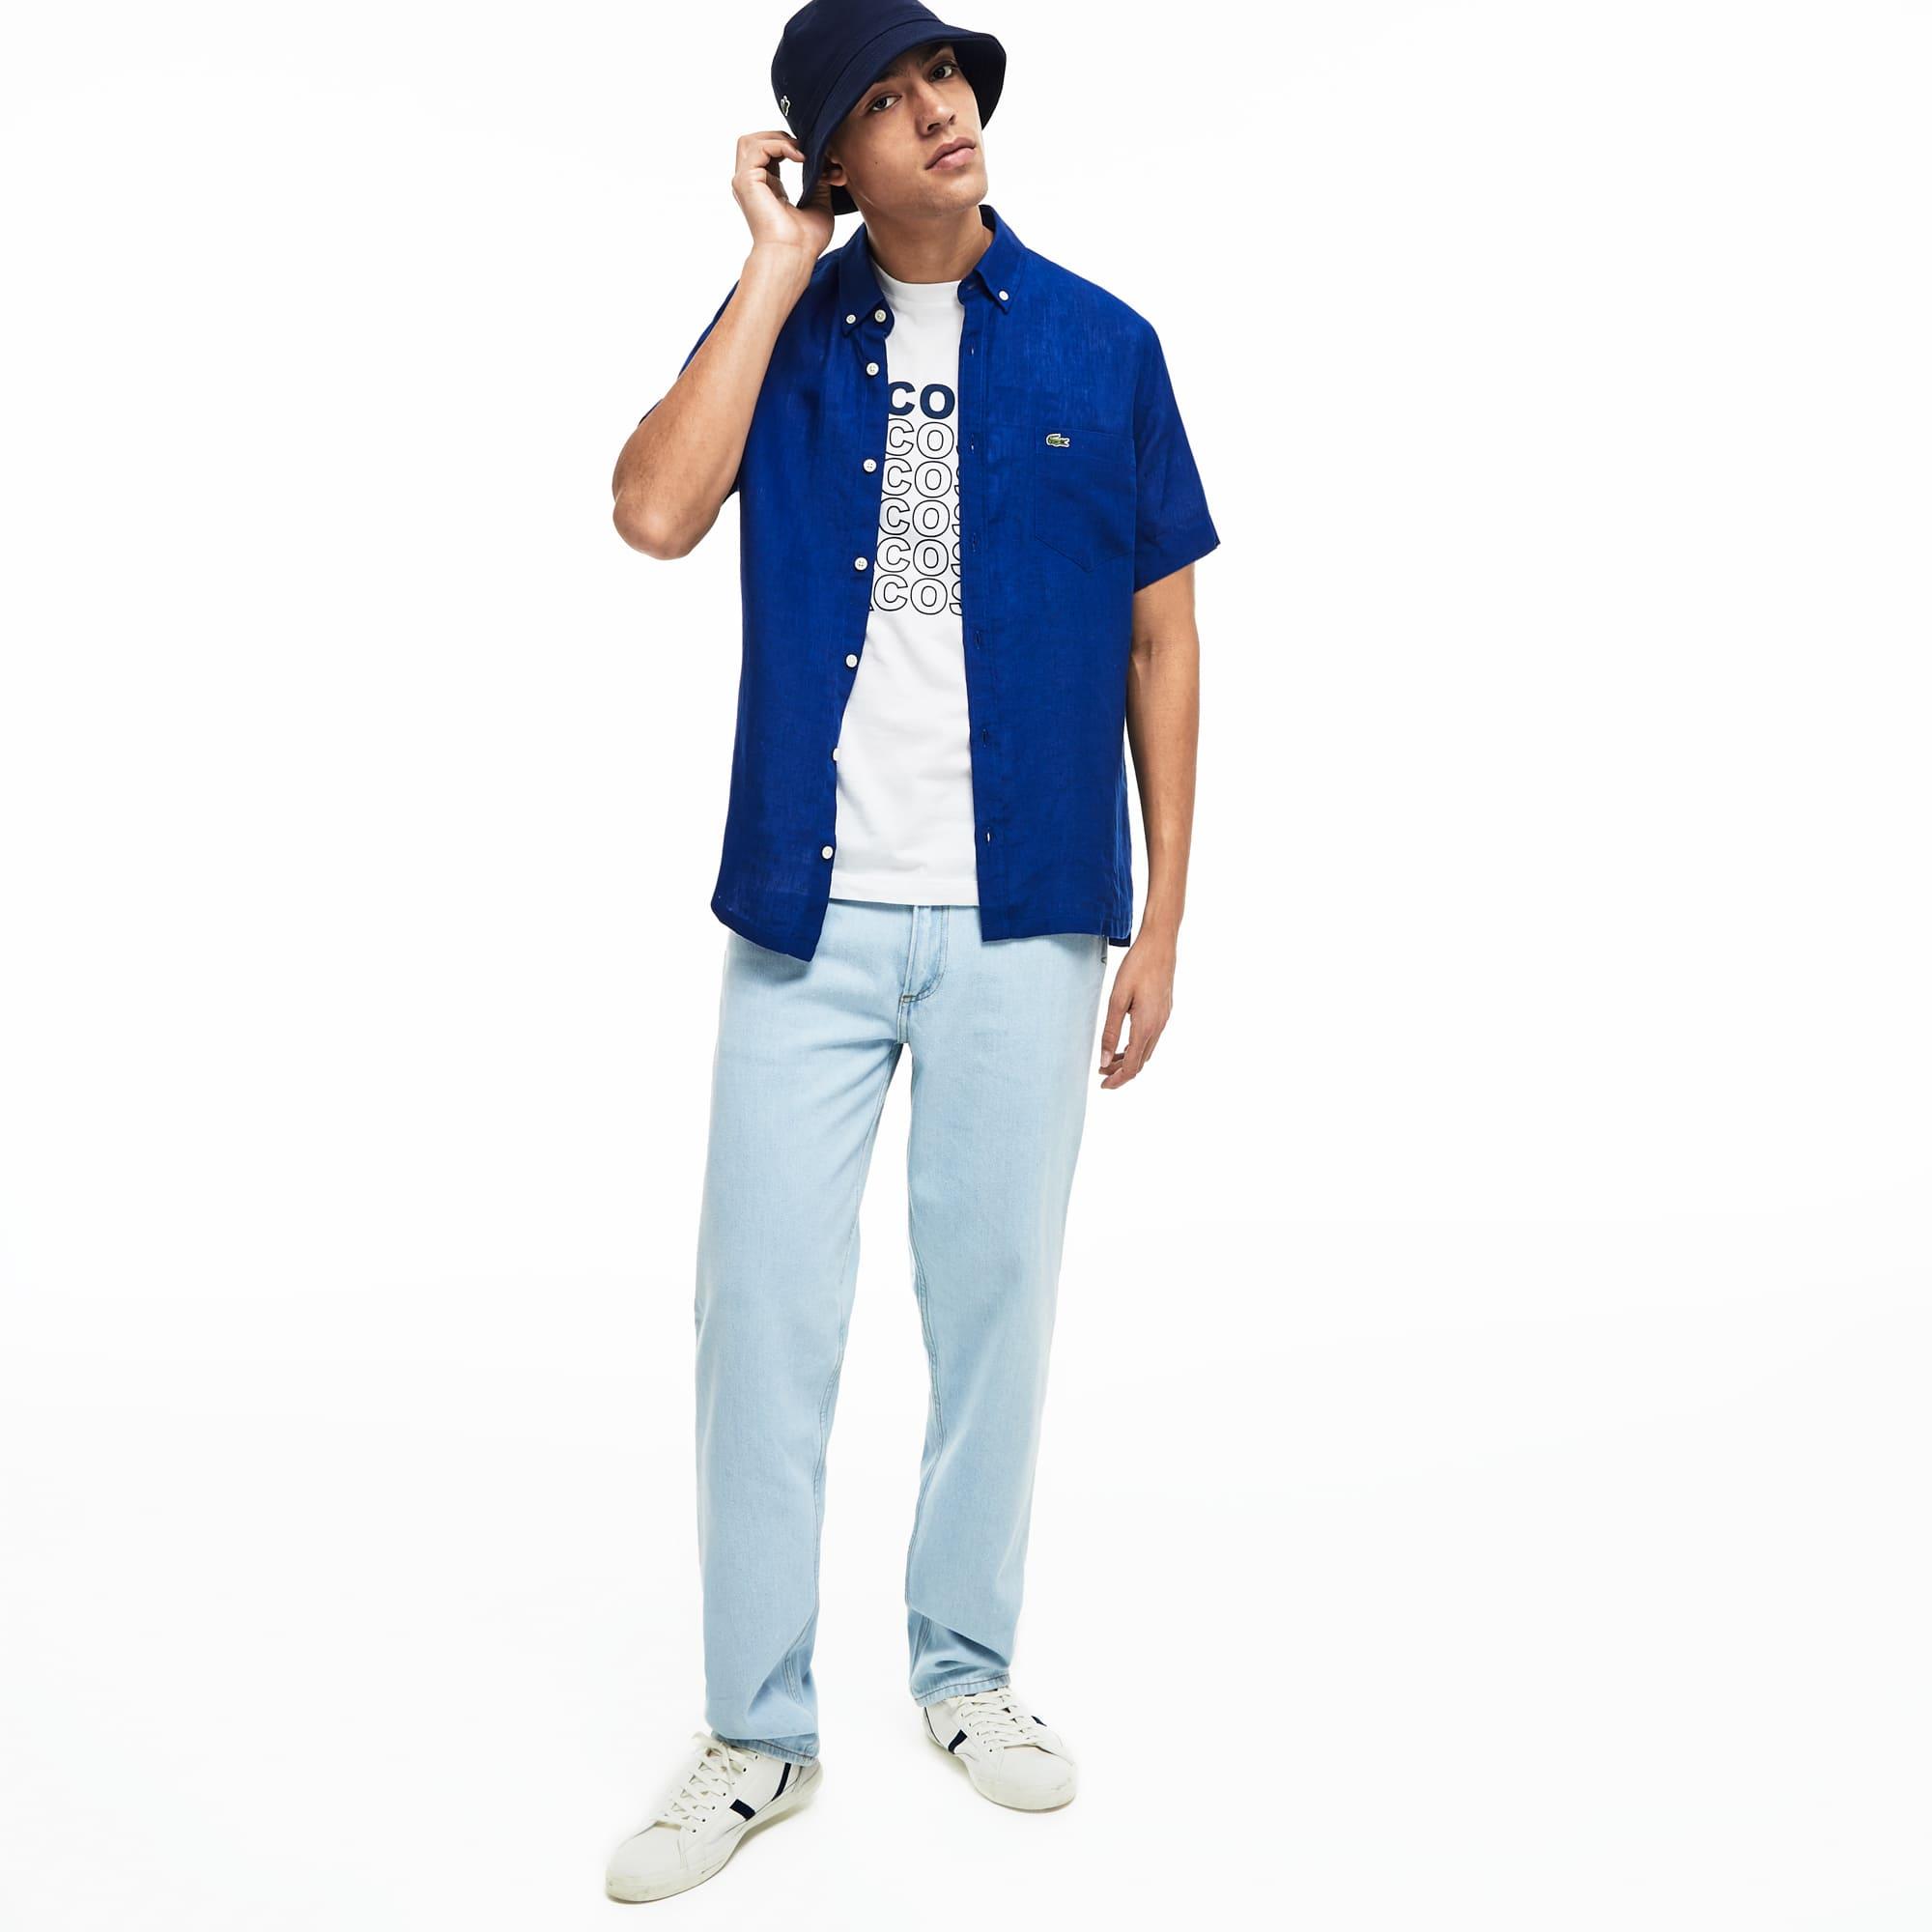 3e25411f Shirts for men | Men's fashion | LACOSTE